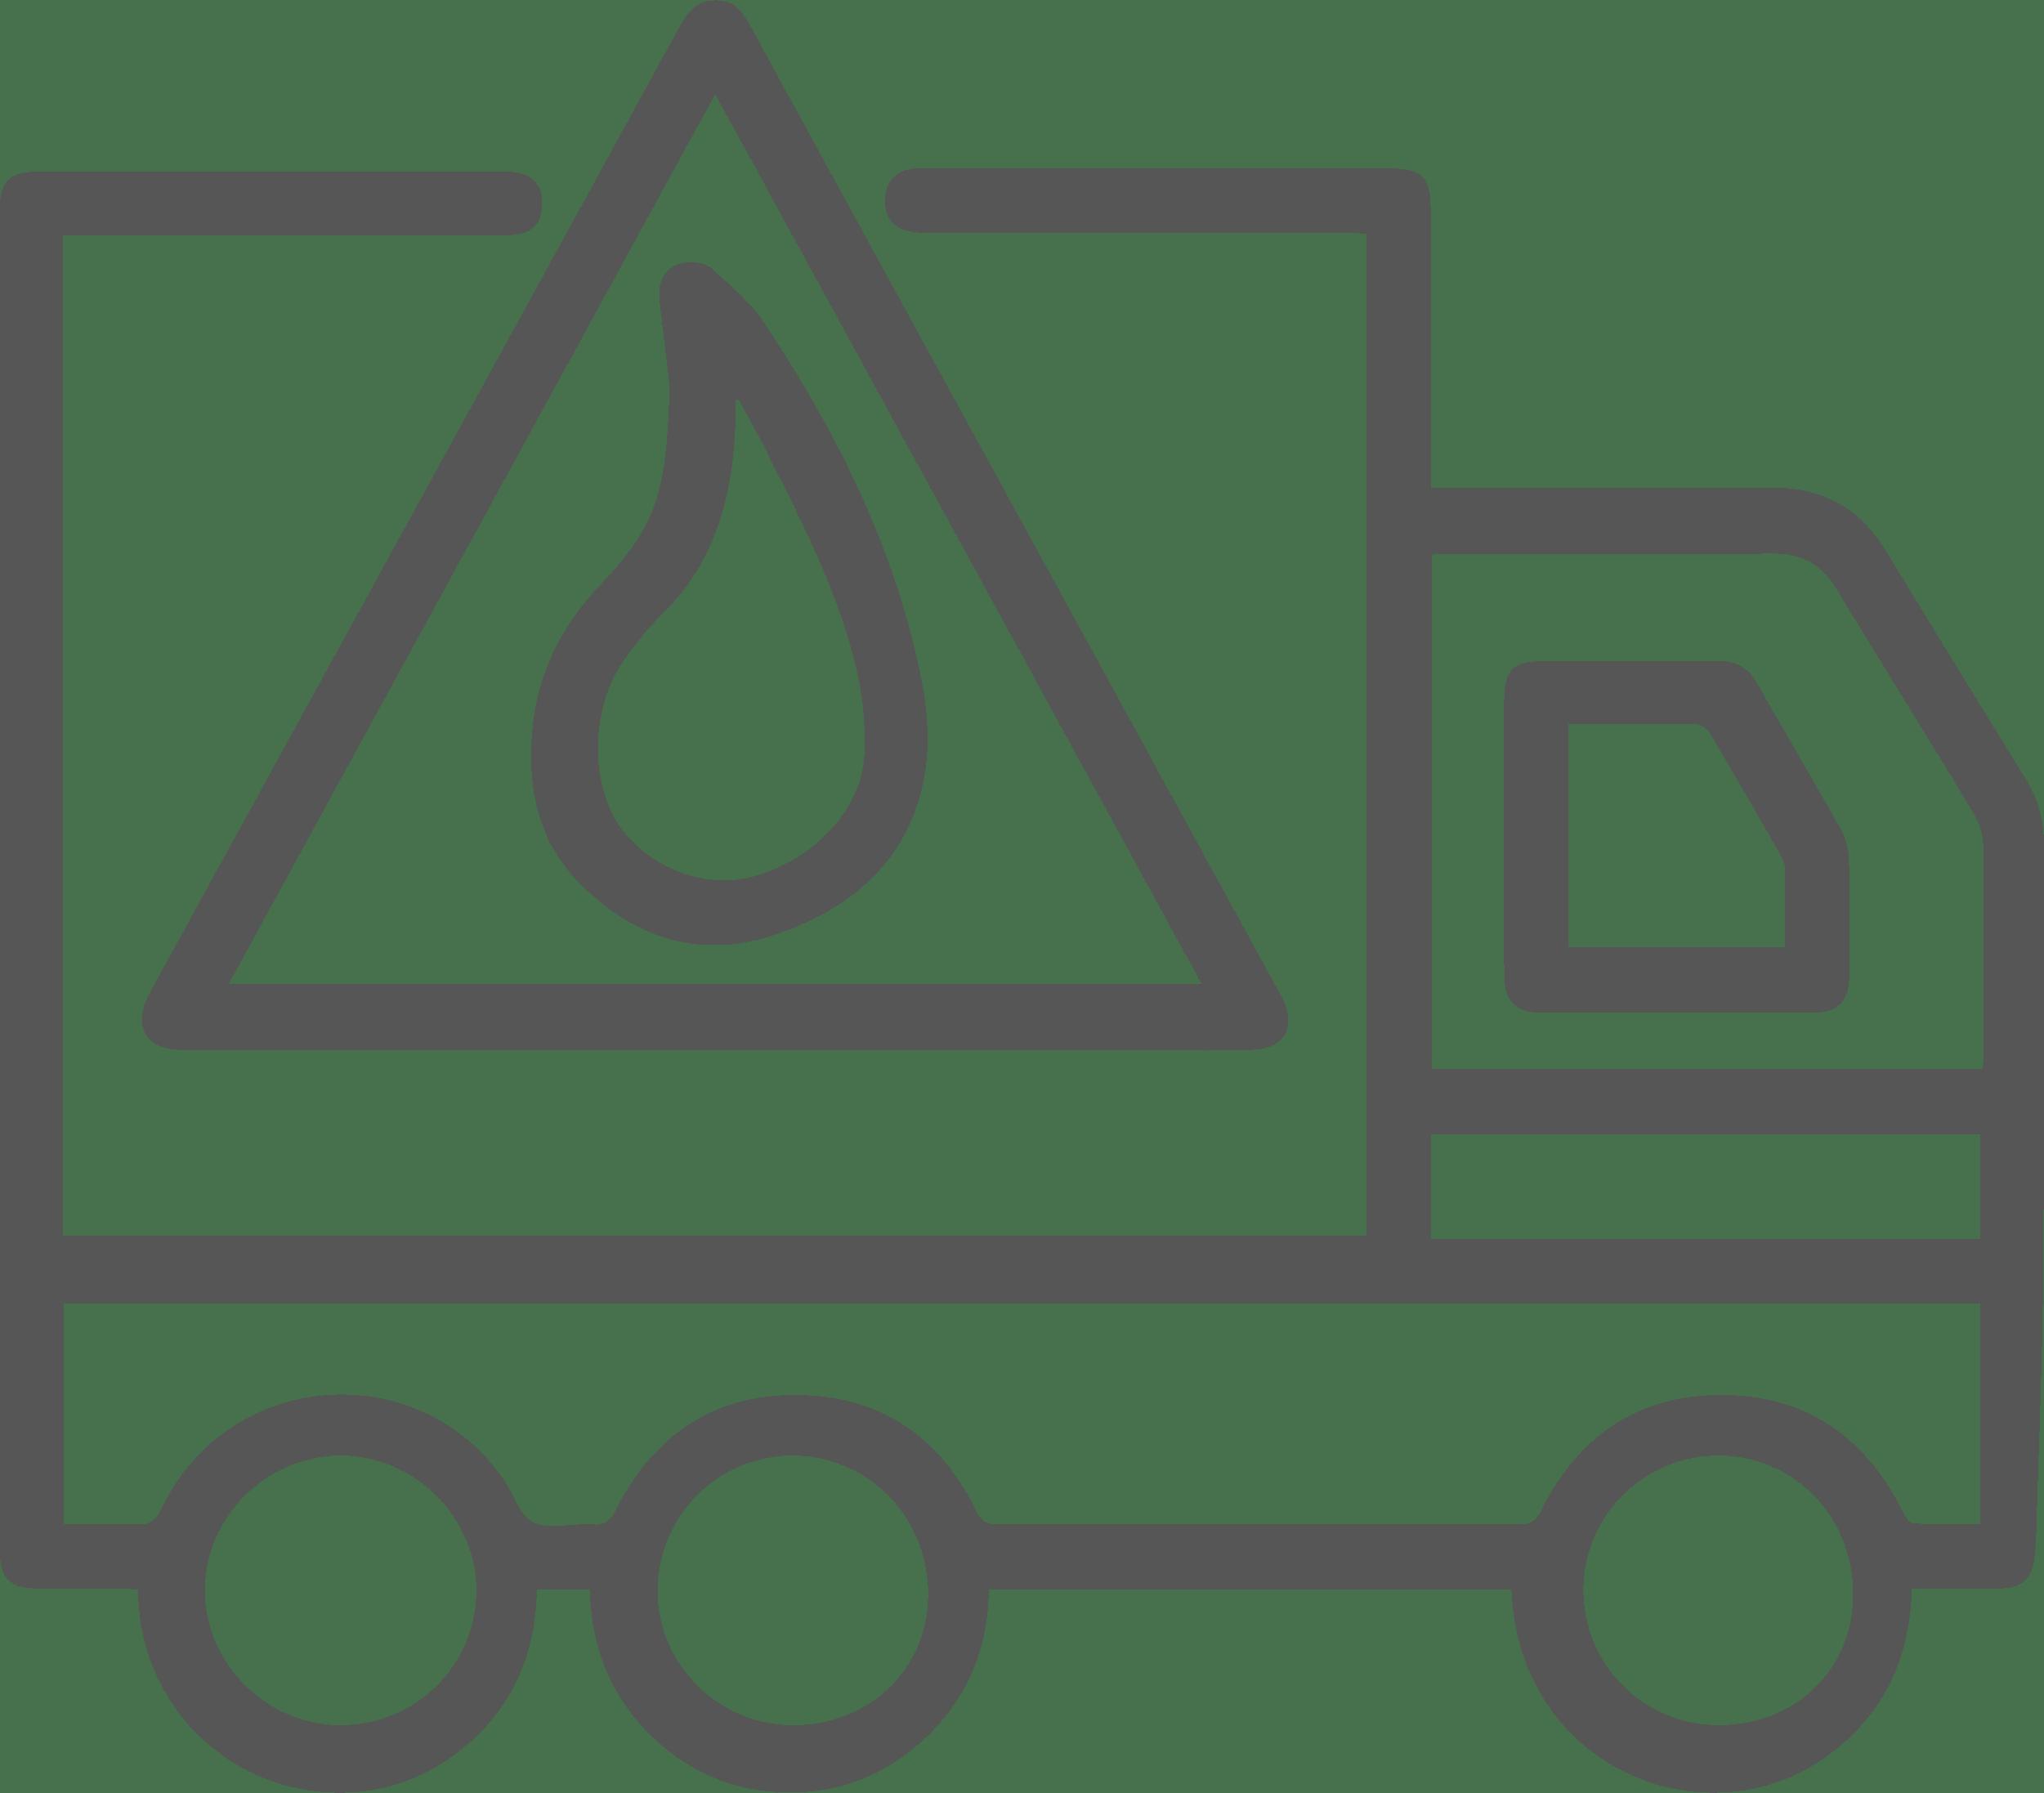 3PL Fulfilment from Bray Solutions | Bray Solutions Ltd